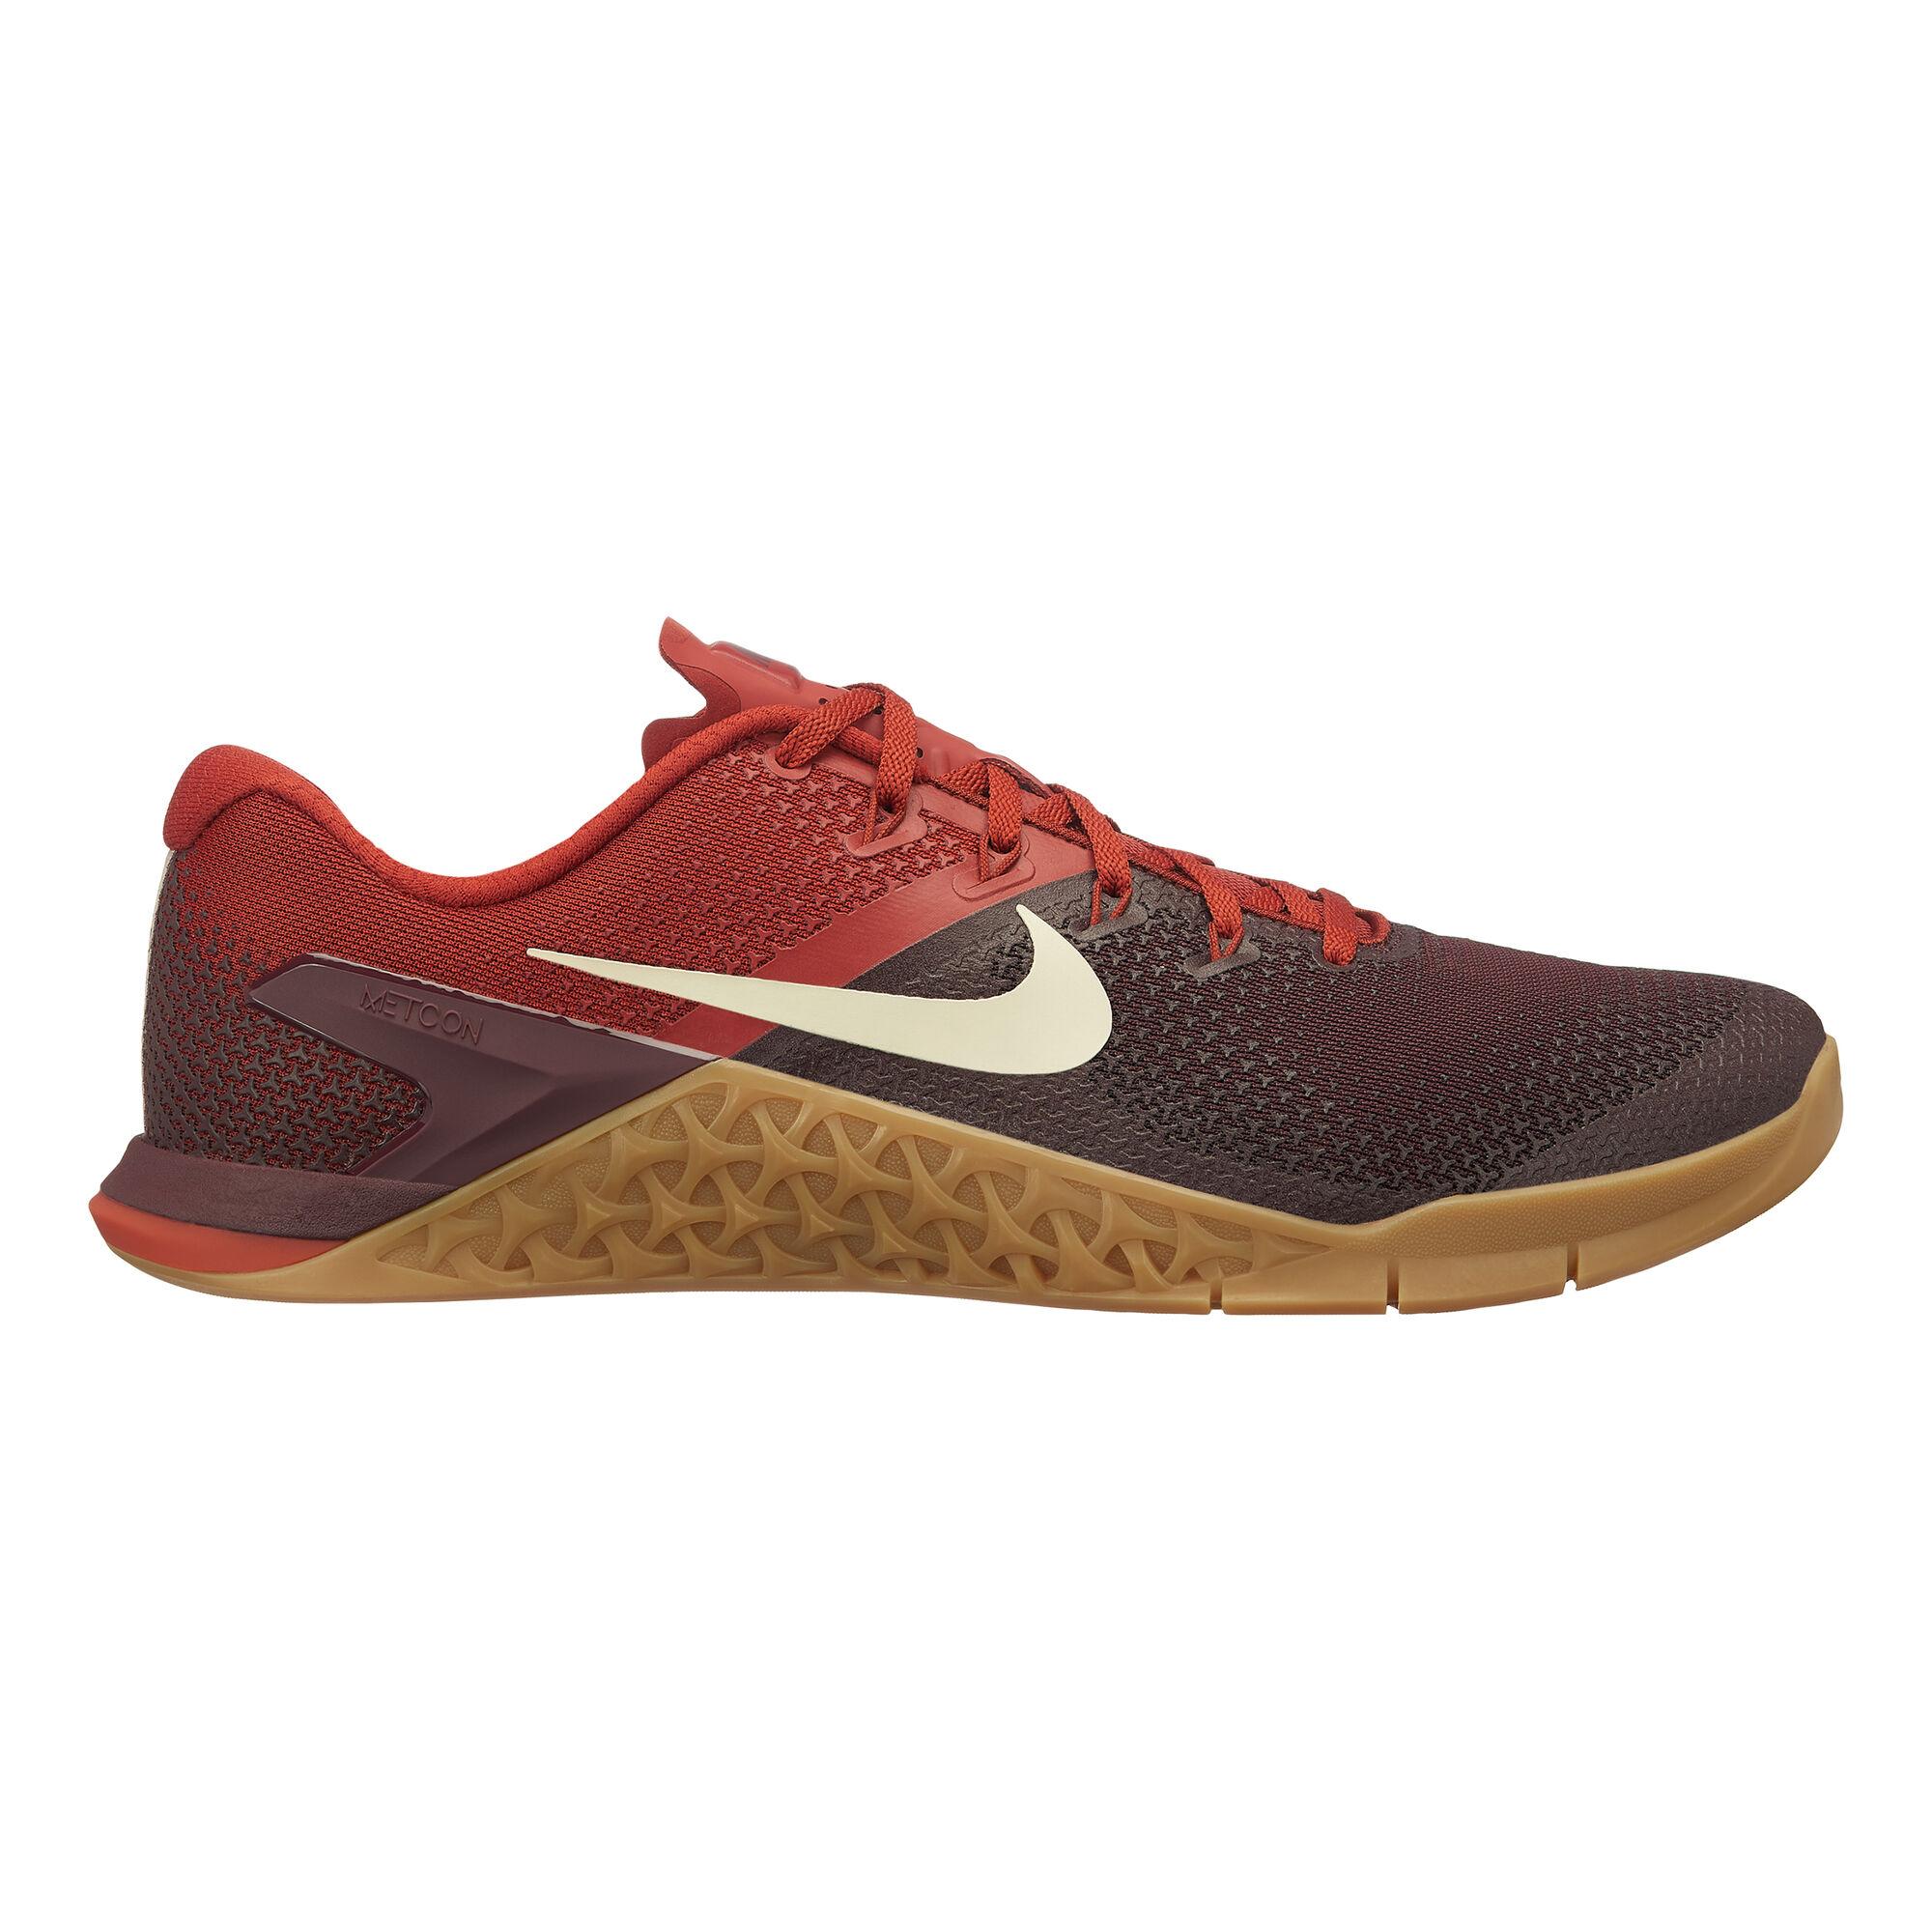 cd647f3371 buy Nike Metcon 4 Fitness Shoe Men - Dark Red